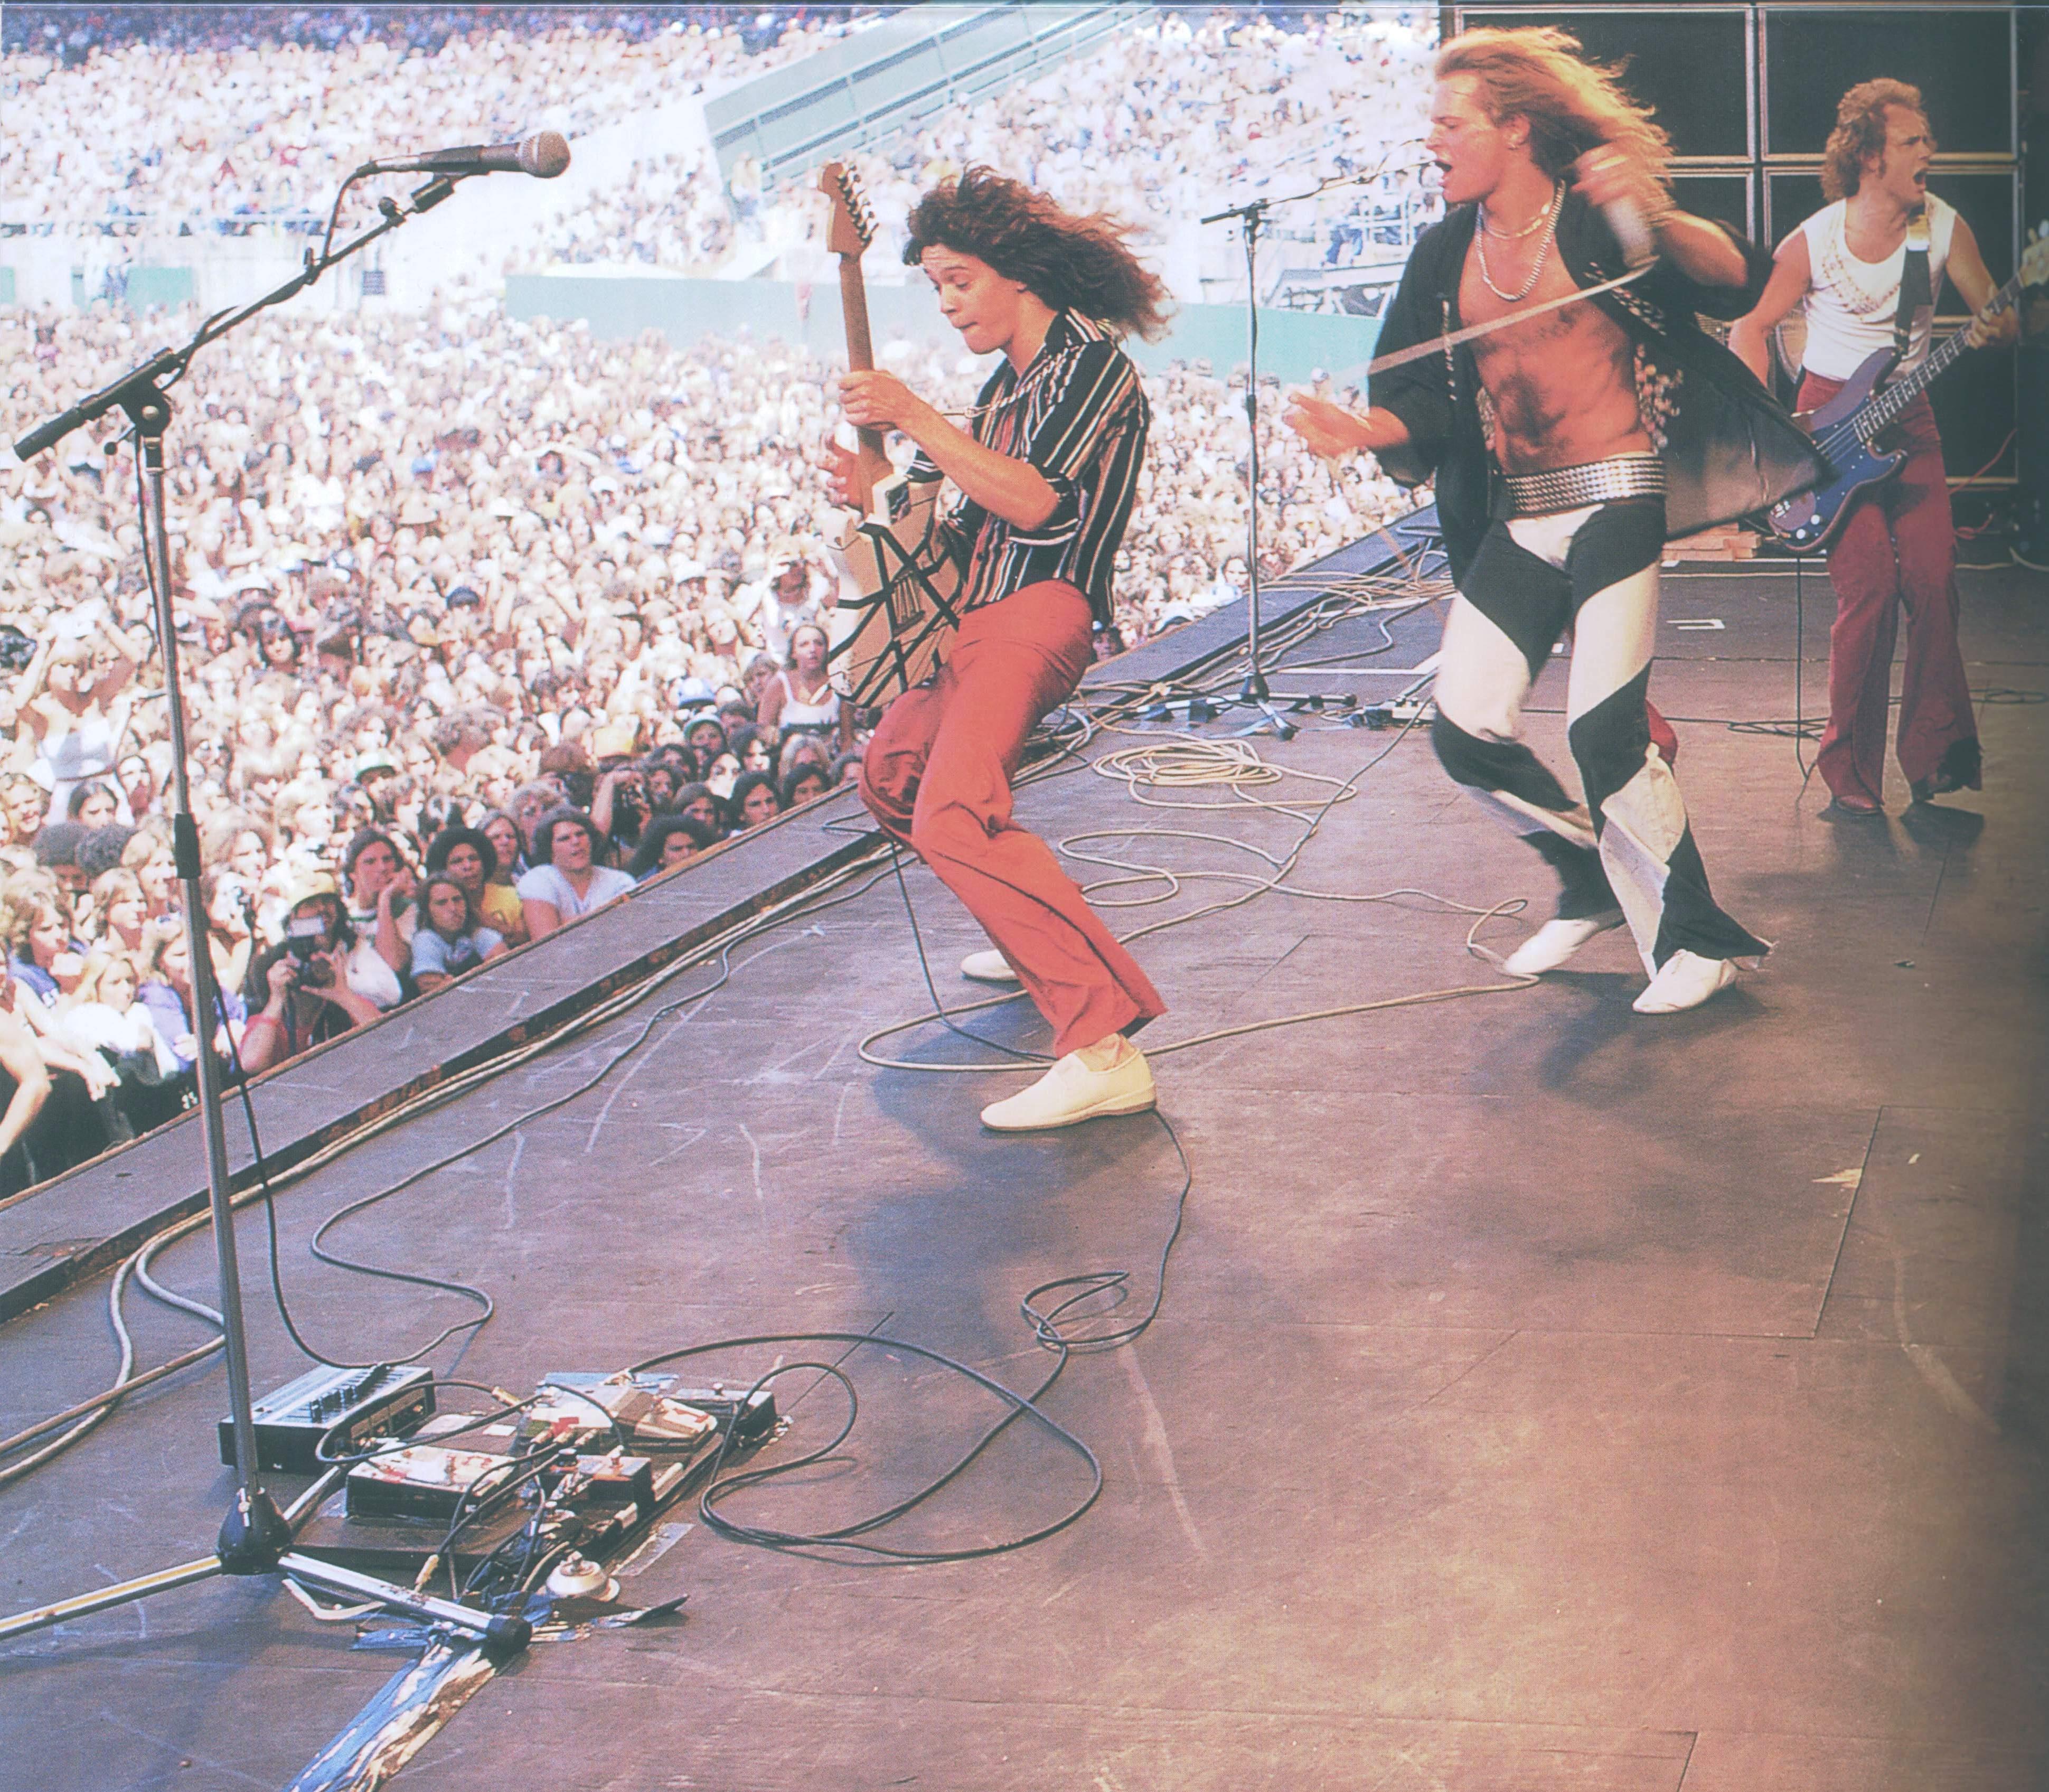 Jose Arredondo Page 3 Metropoulos Forum Wiring Diagram For Eddie Van Halen Http Wwwcdcnsnejp Epi Pedalboard23jul1978